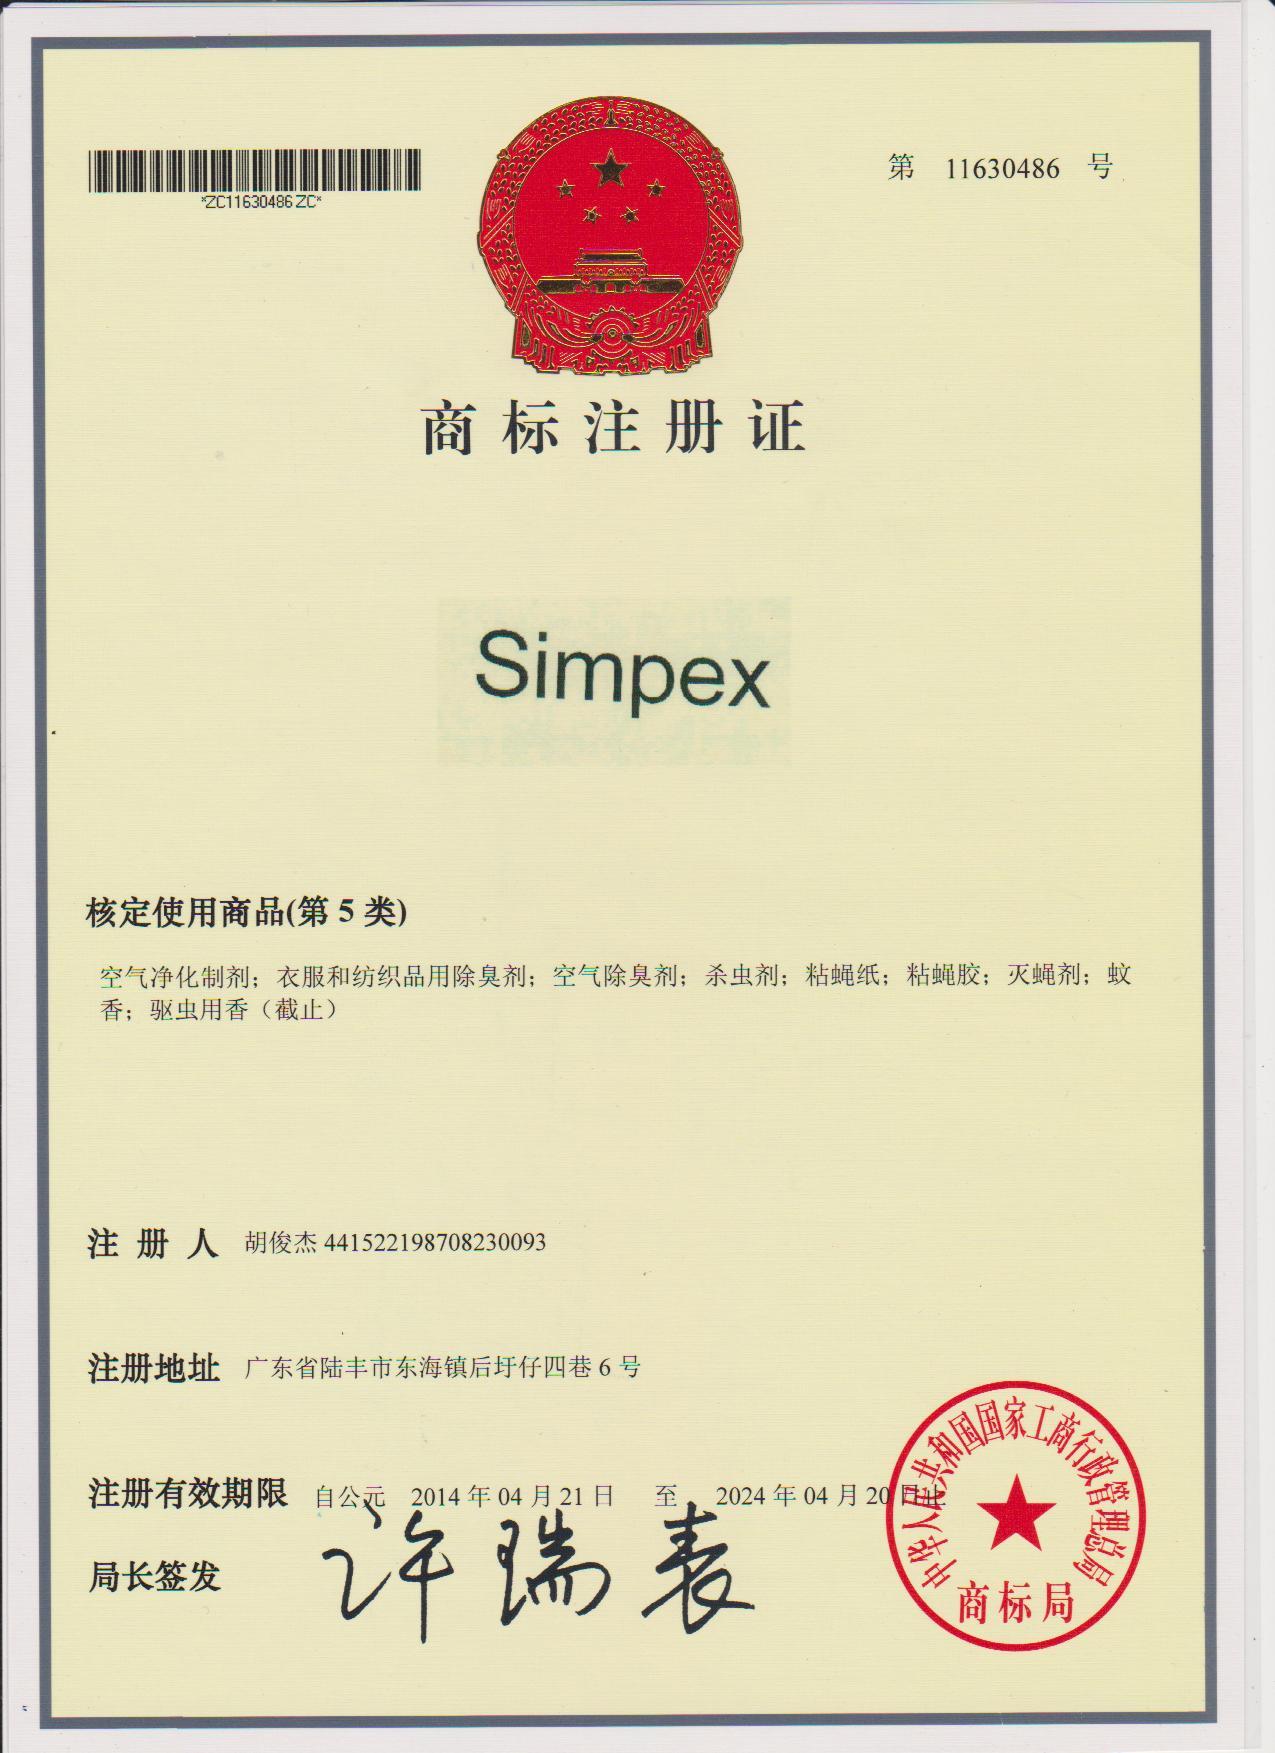 SImpex certificate